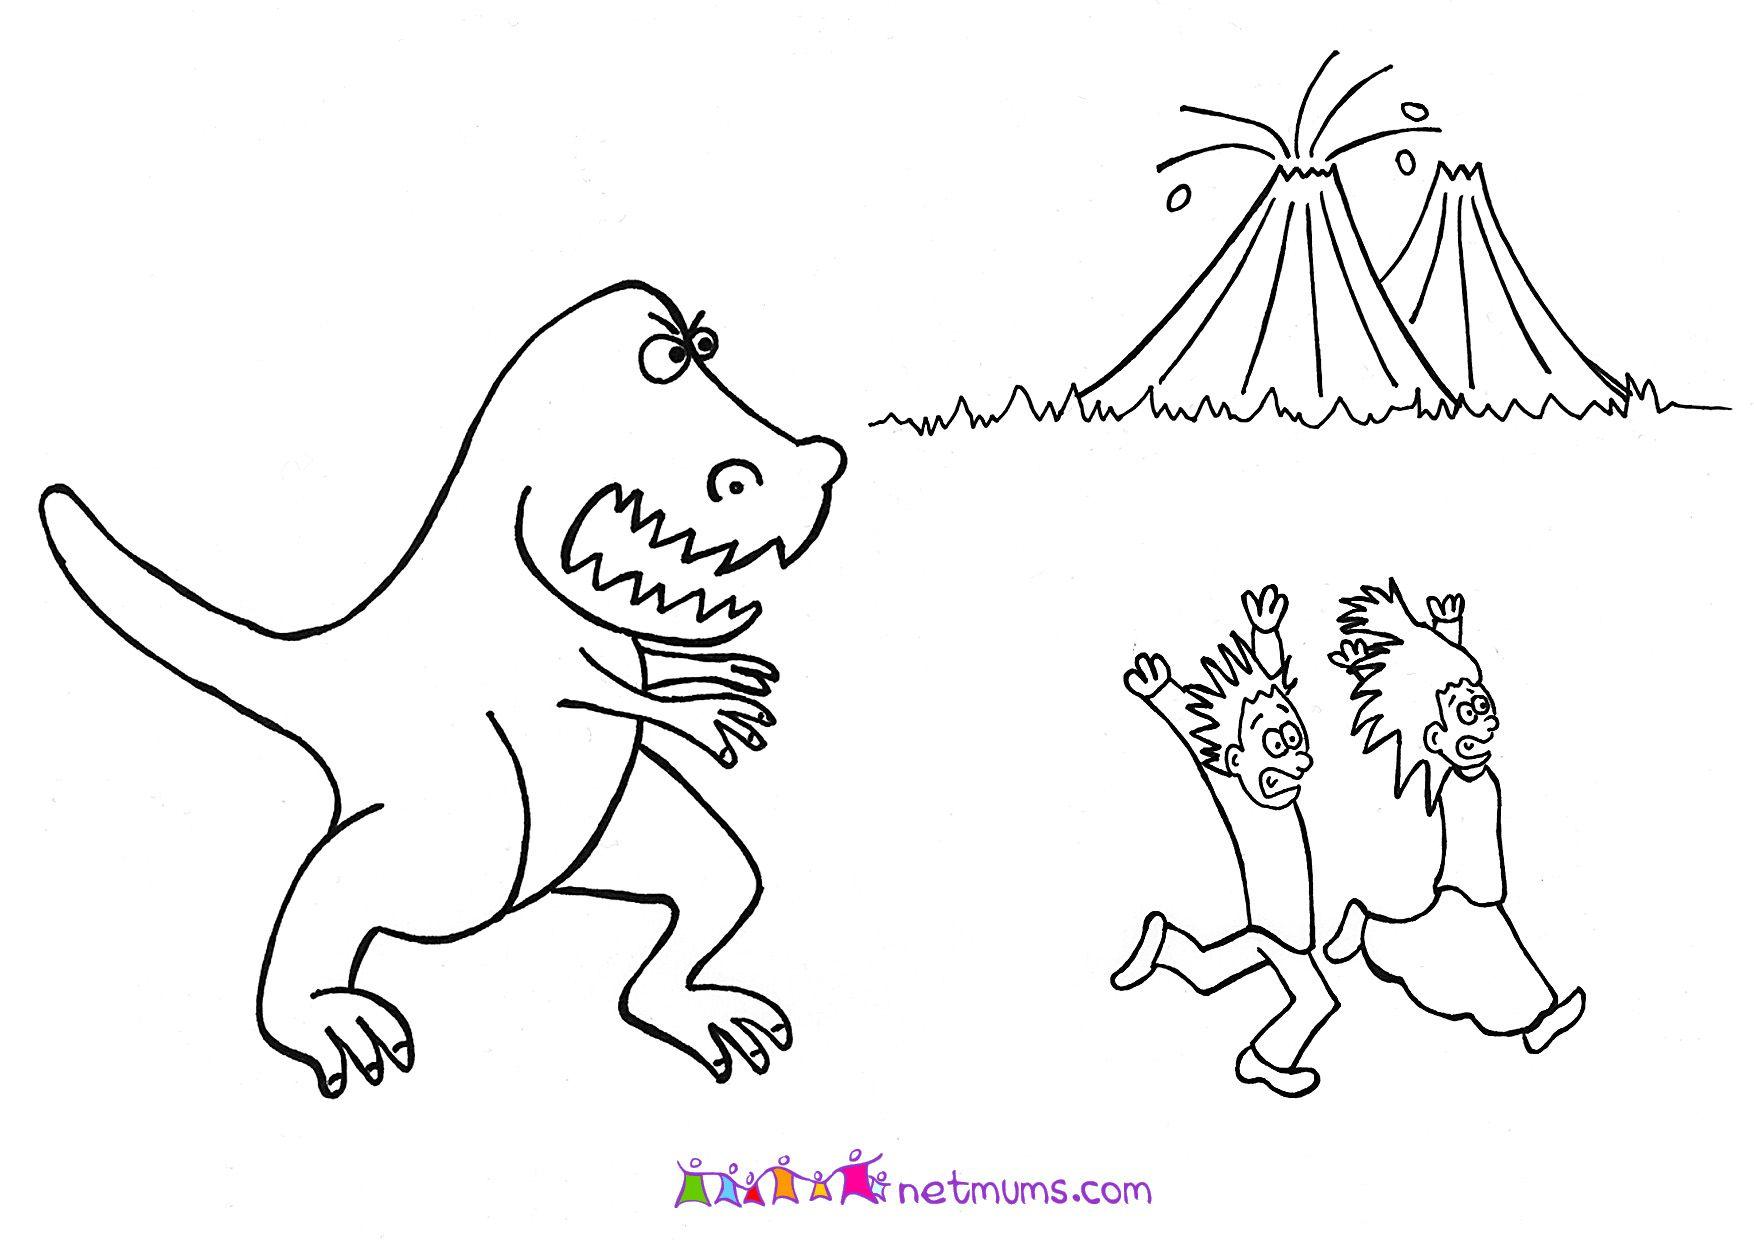 t rex coloring page 2 1754x1240 Stencils Pinterest Coloring